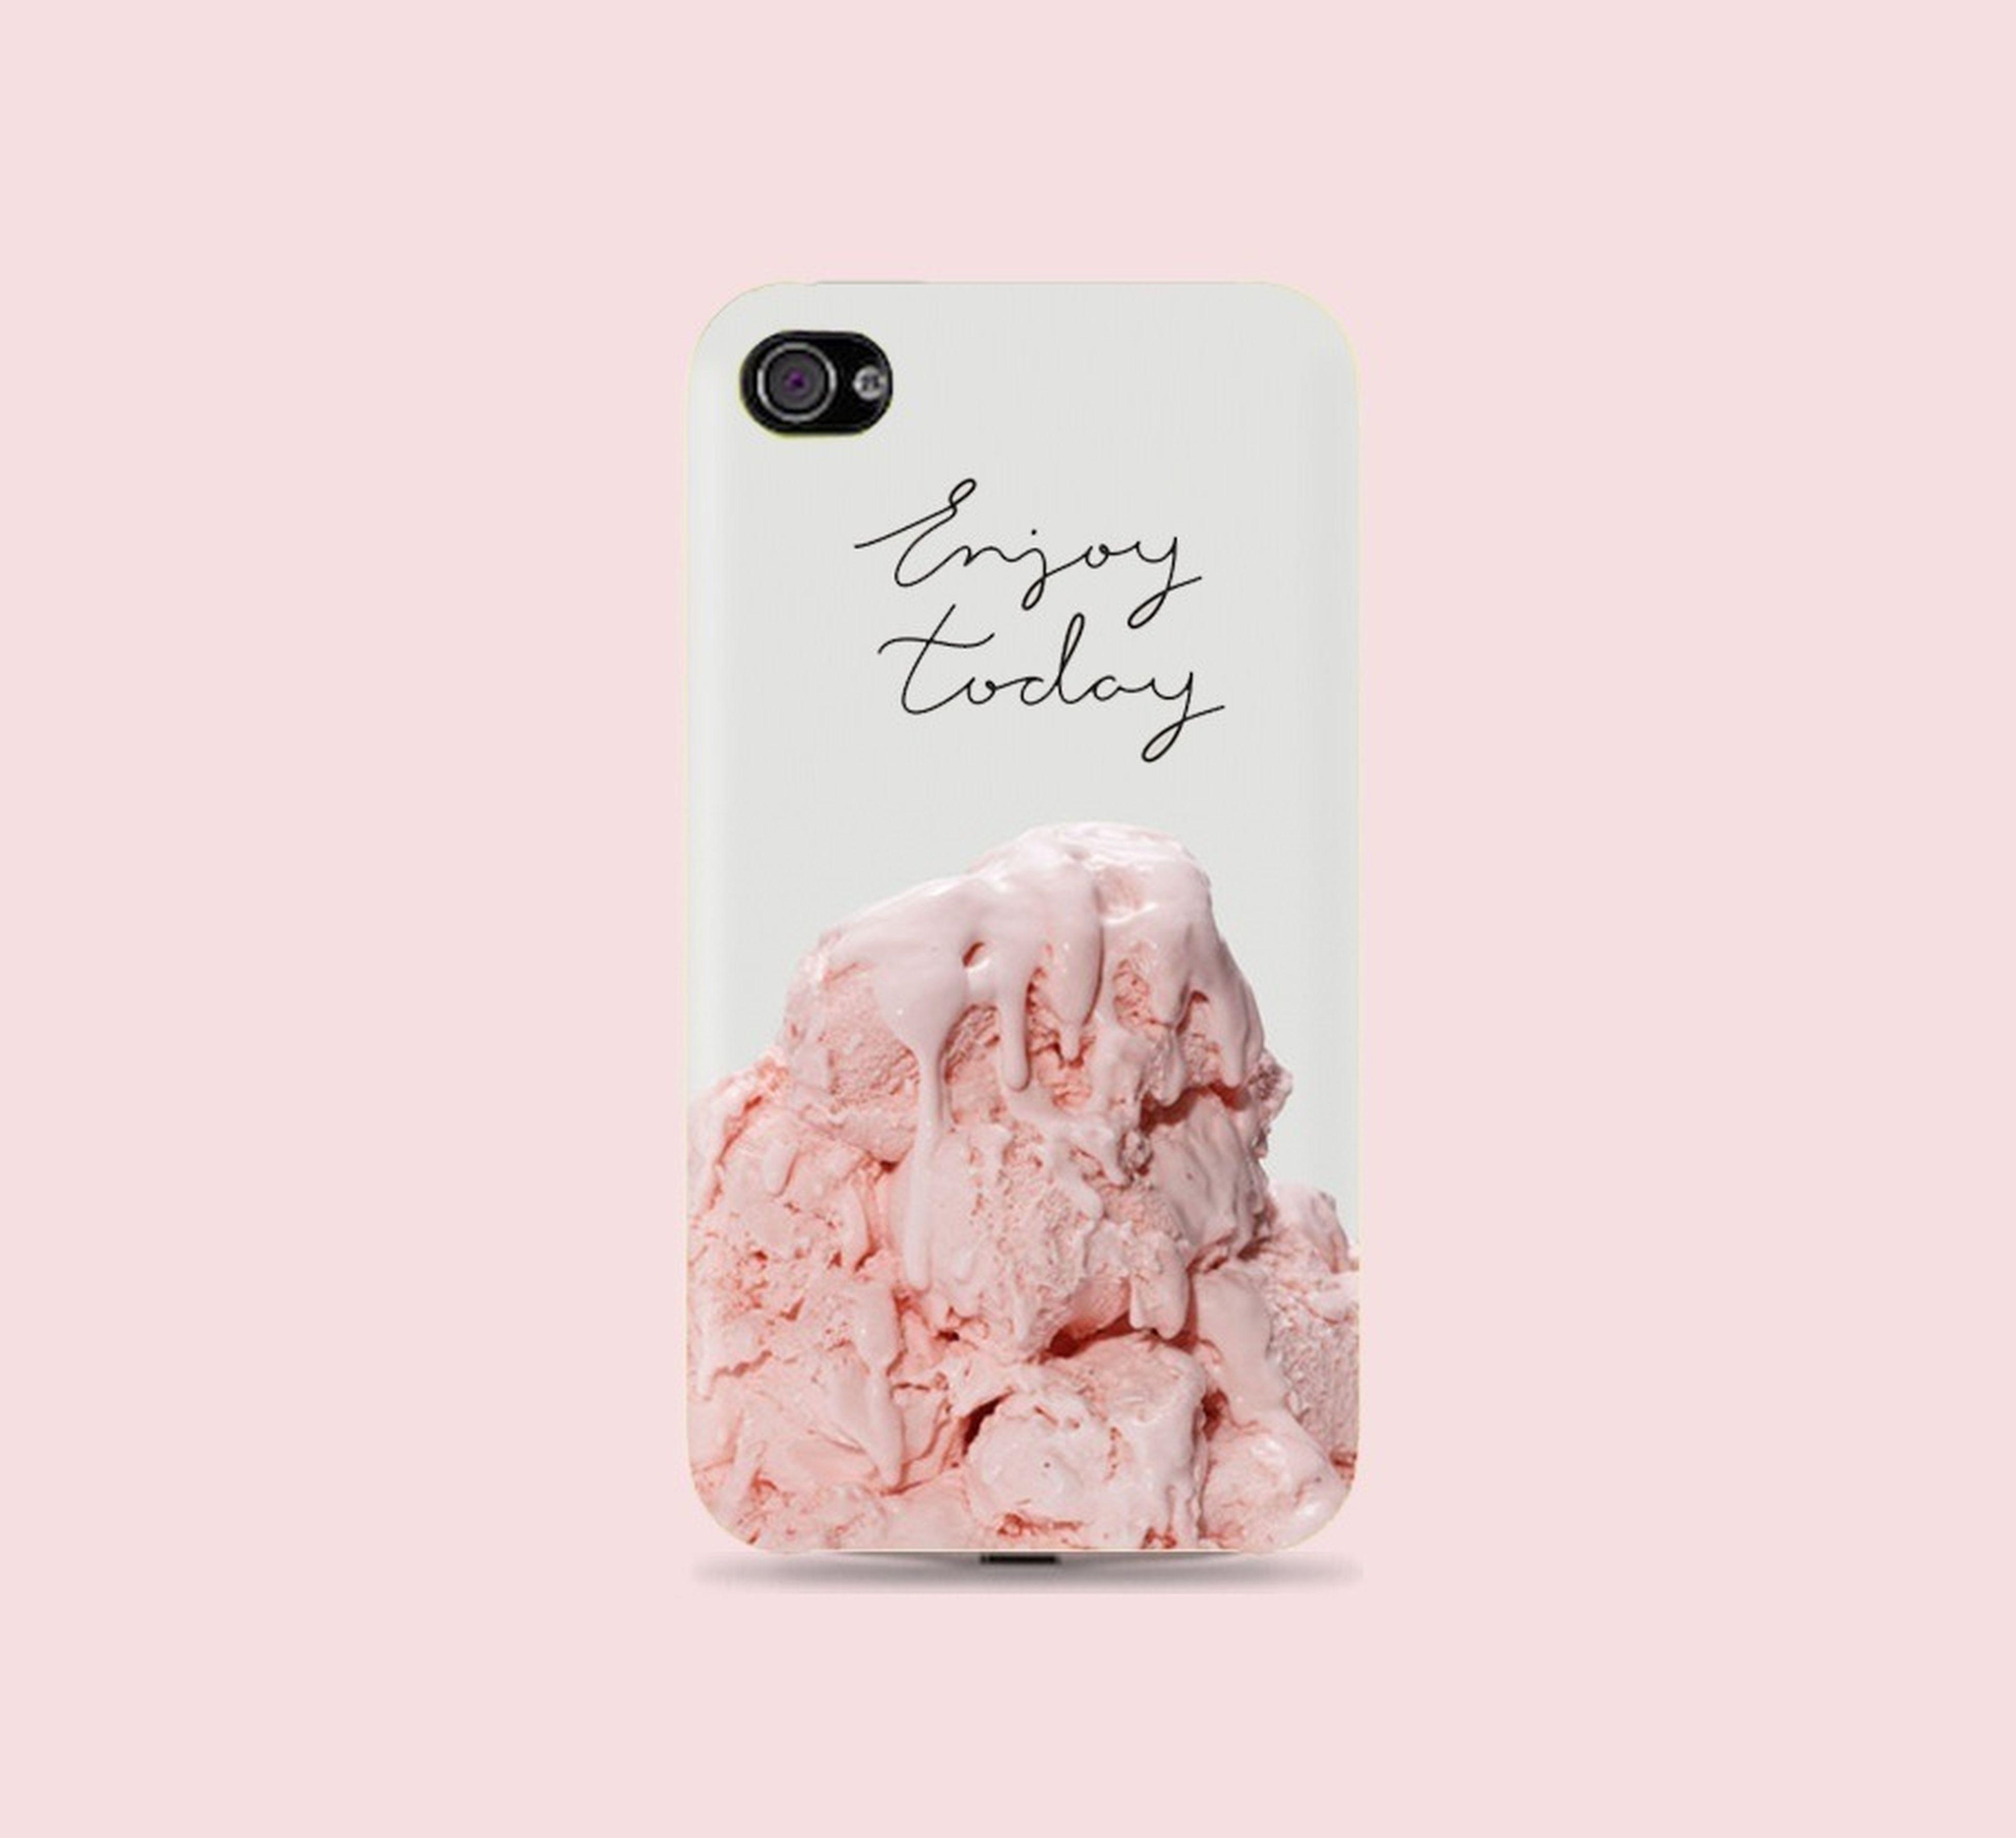 Iphone Case Street Fashion Ice Cream Food Porn